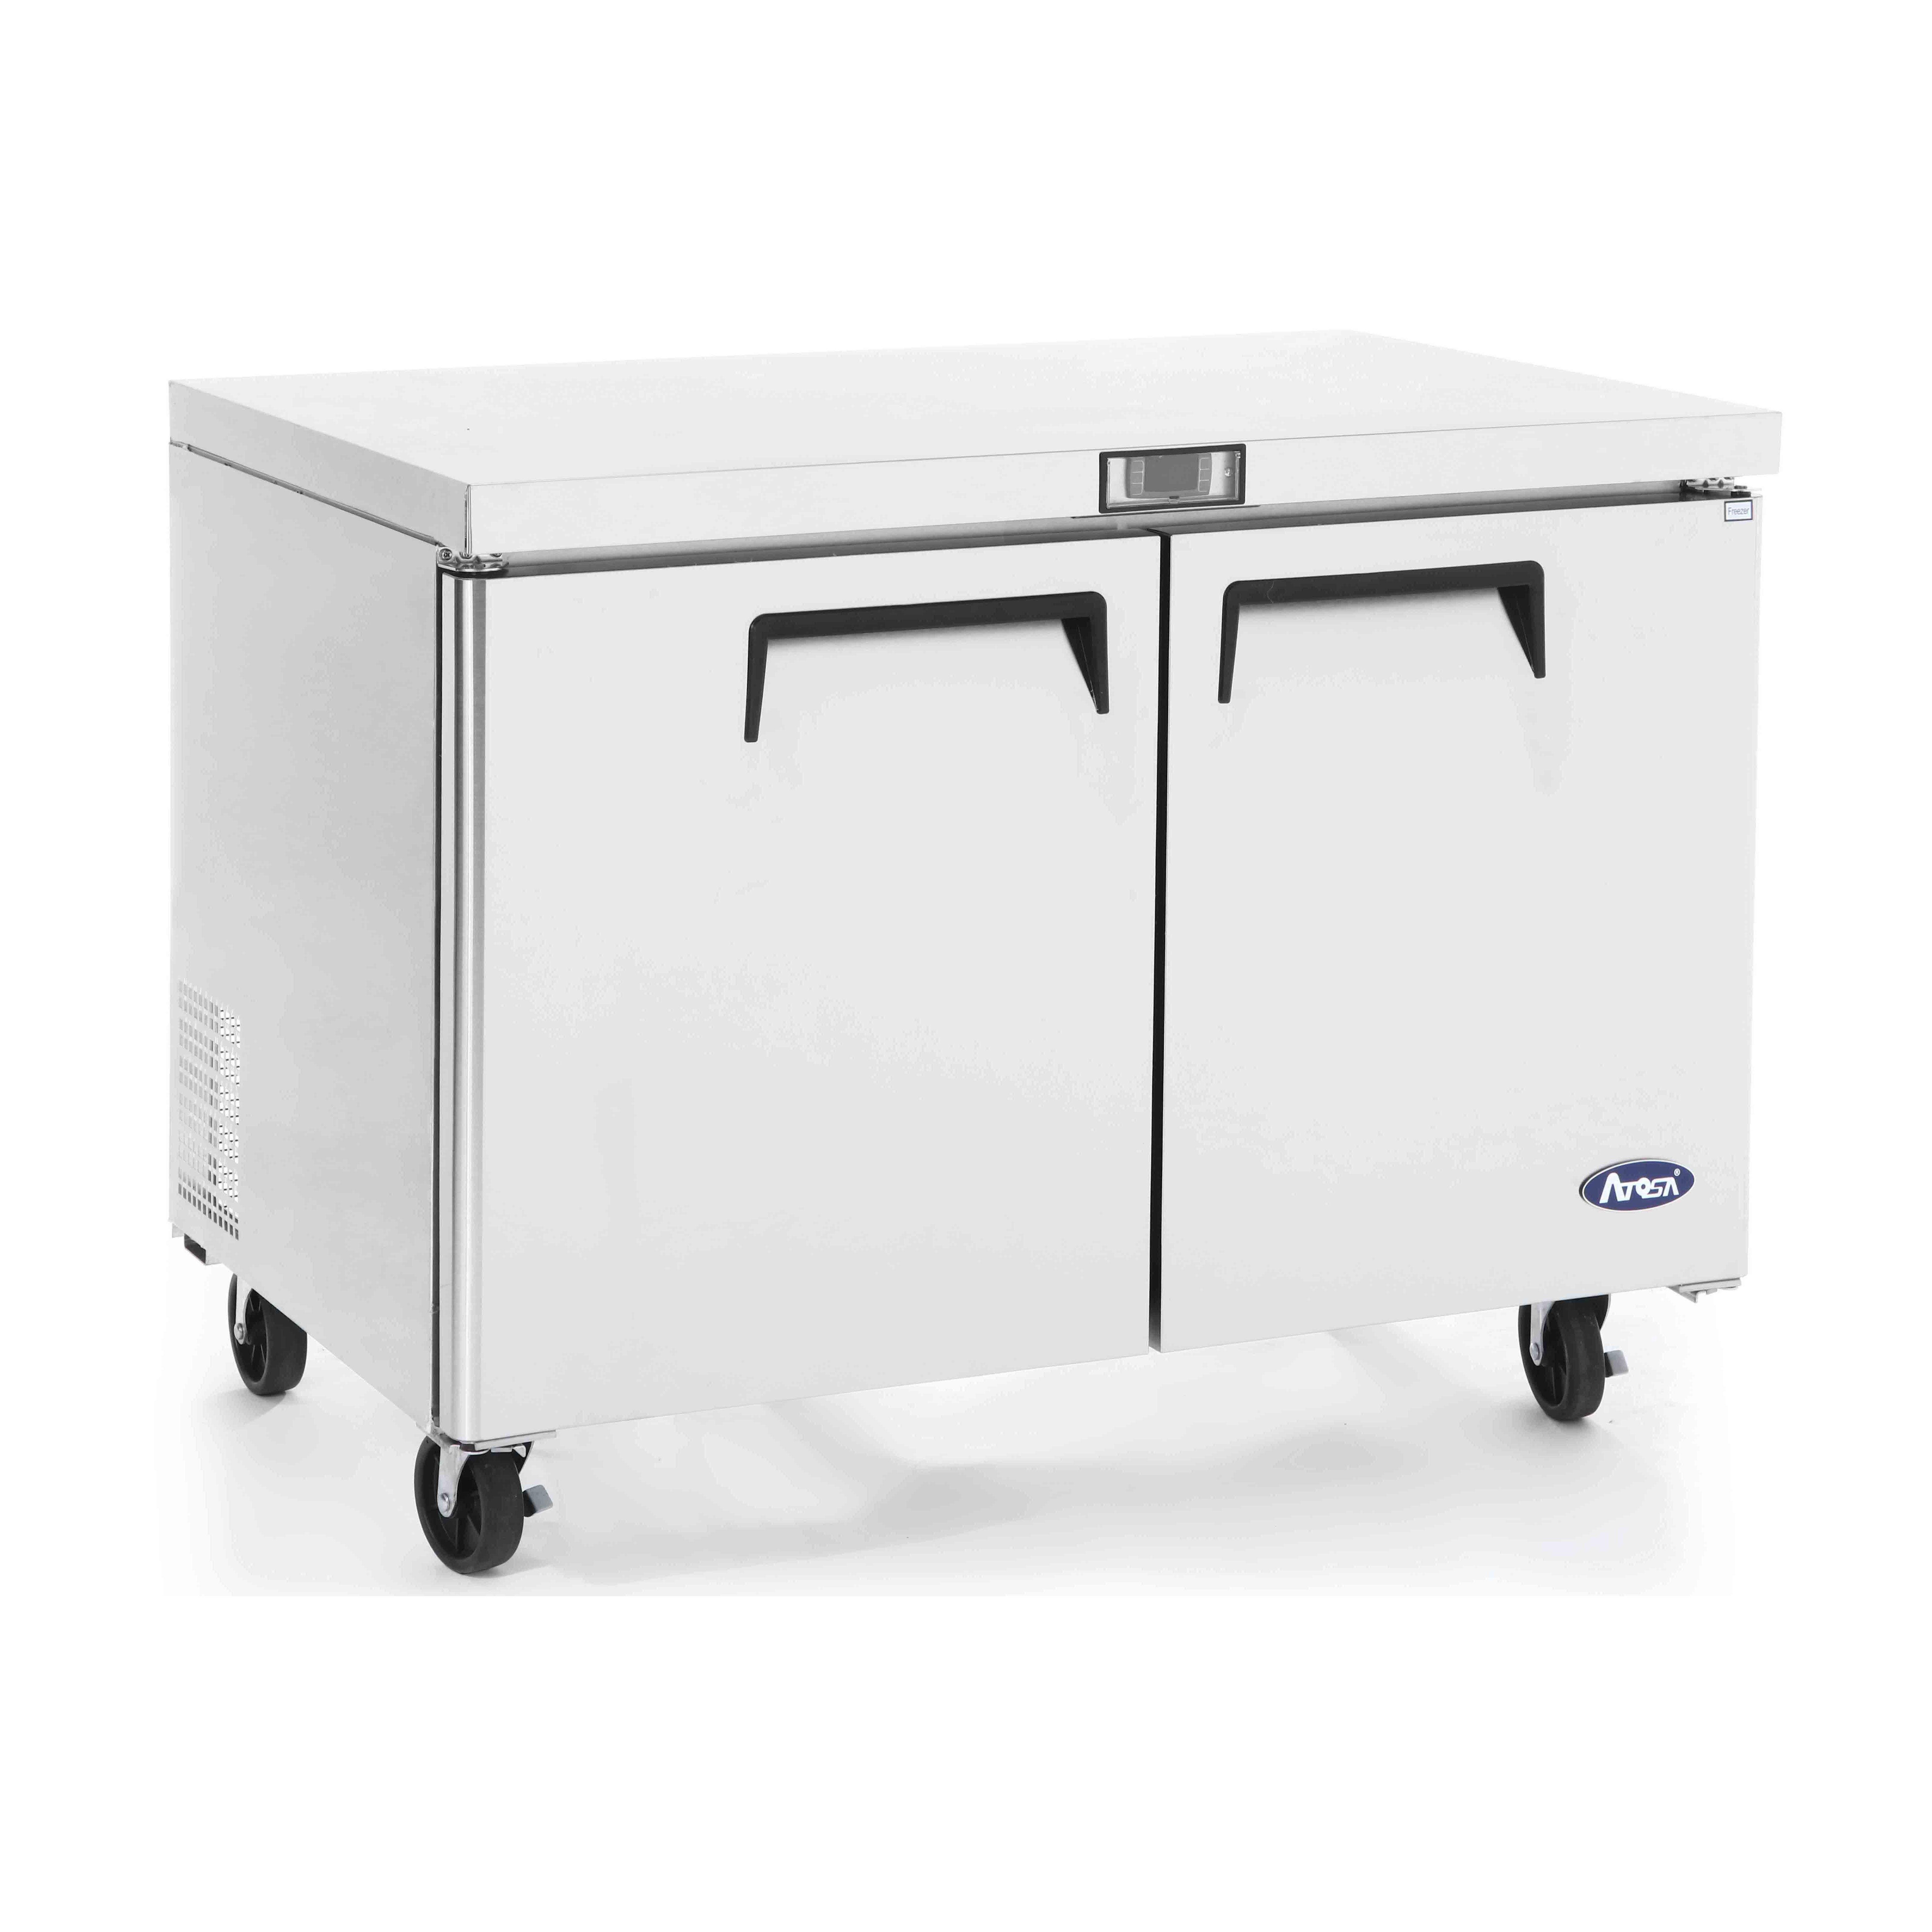 Atosa USA MGF8406GR freezer, undercounter, reach-in